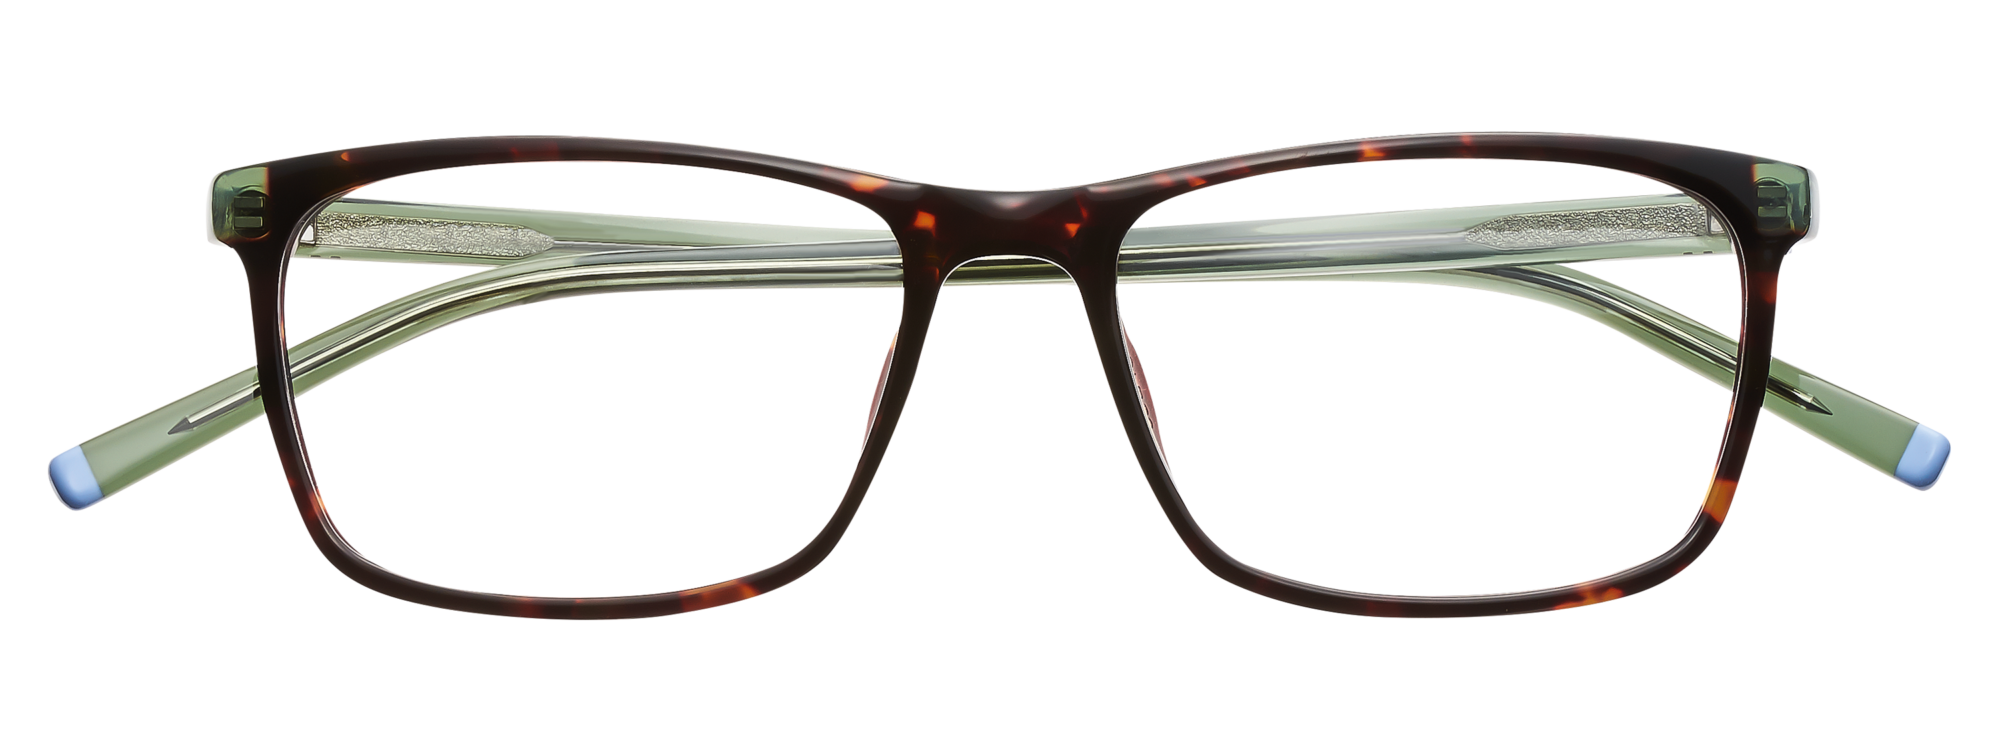 7d228d1bf4e model 581035 – HUMPHREY´S eyewear